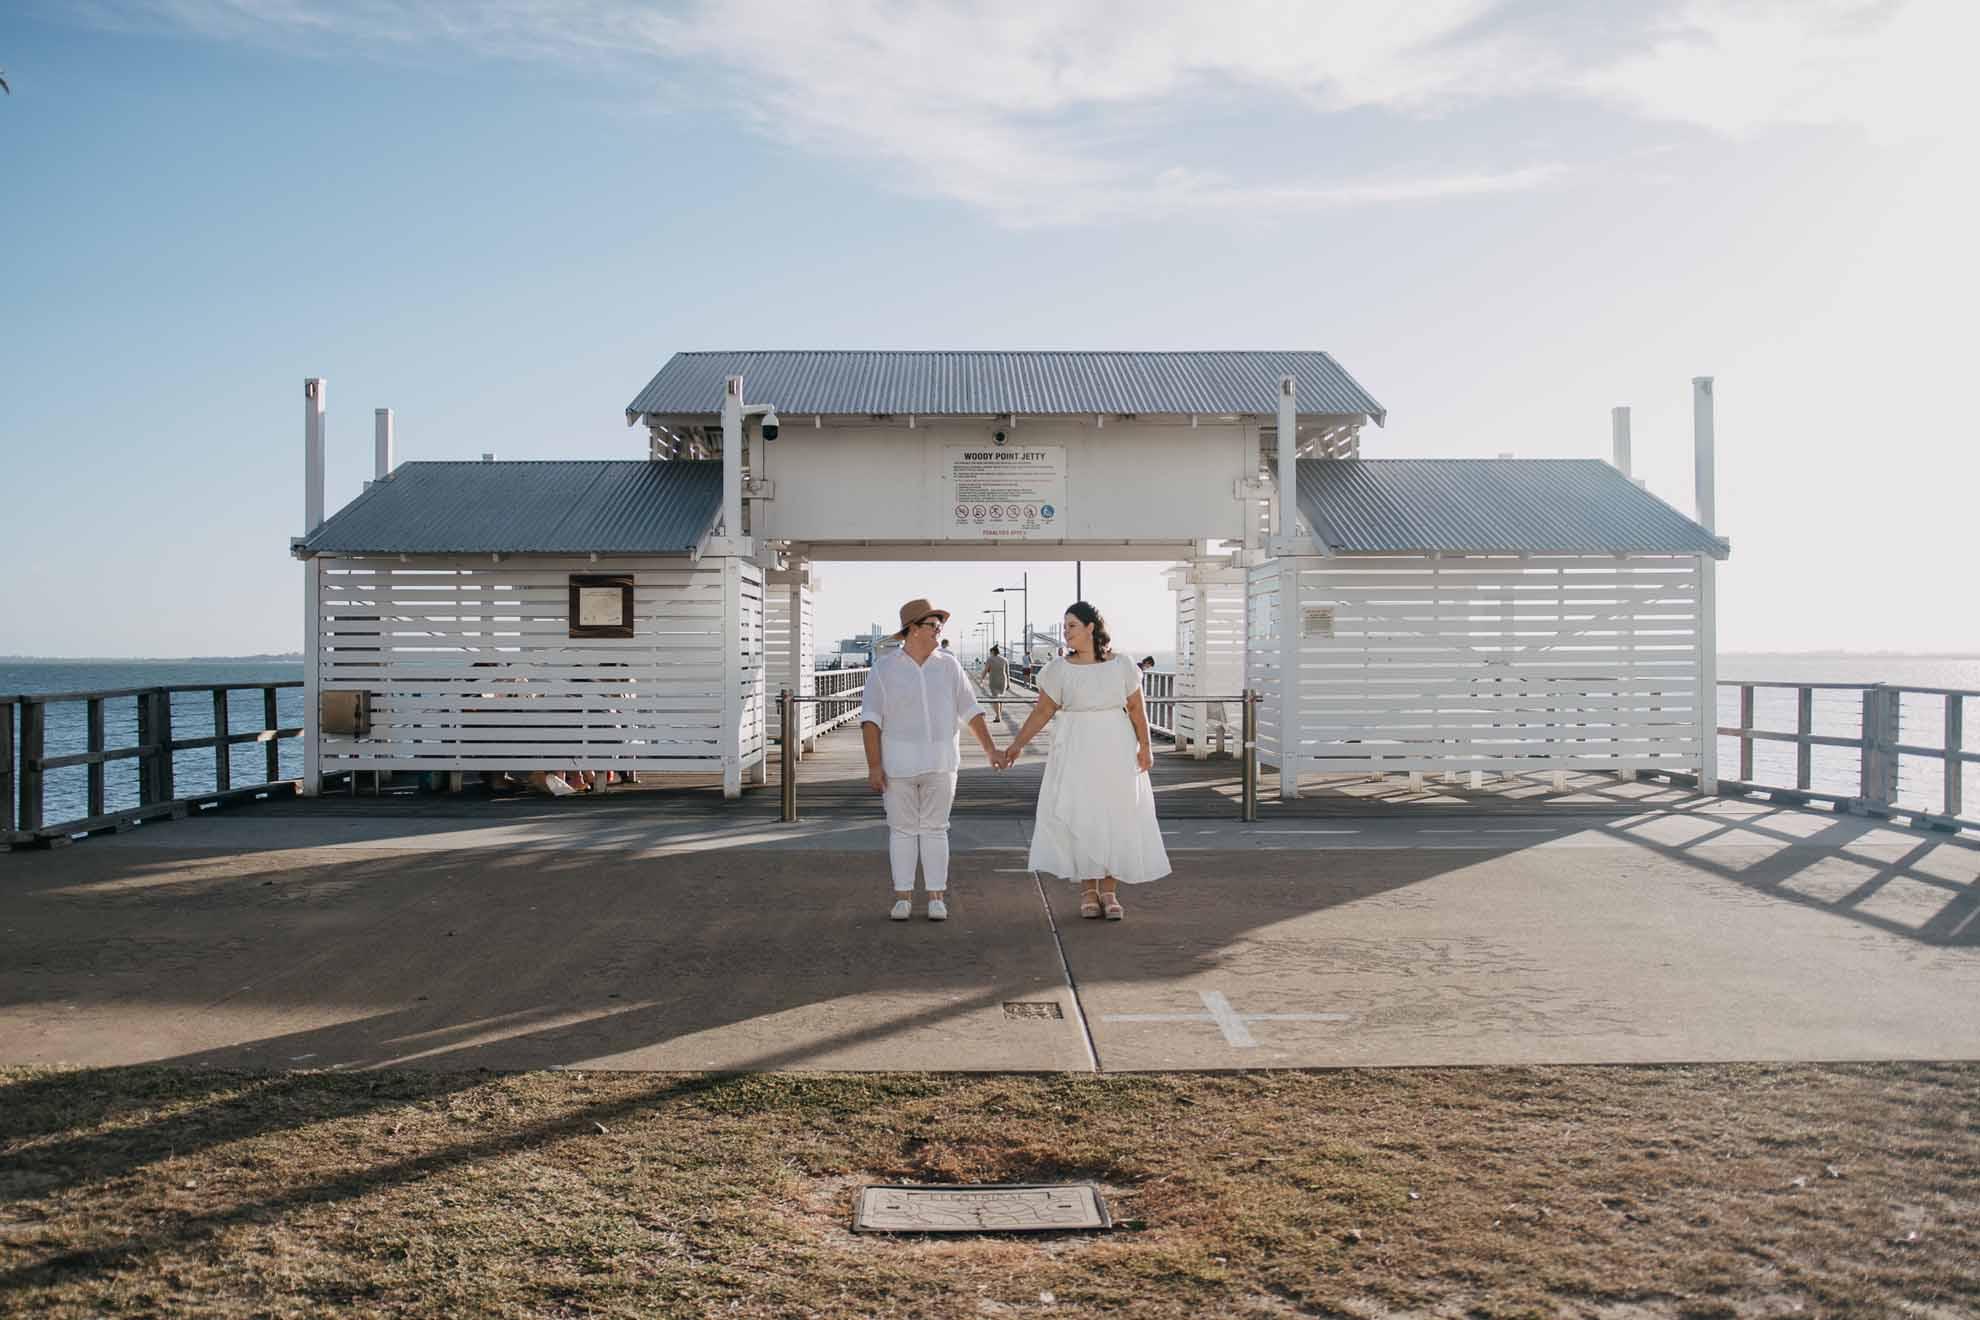 Bent Film Co lesbian same-sex beach elopement wedding Australia Queensland Dancing With Her magazine directory